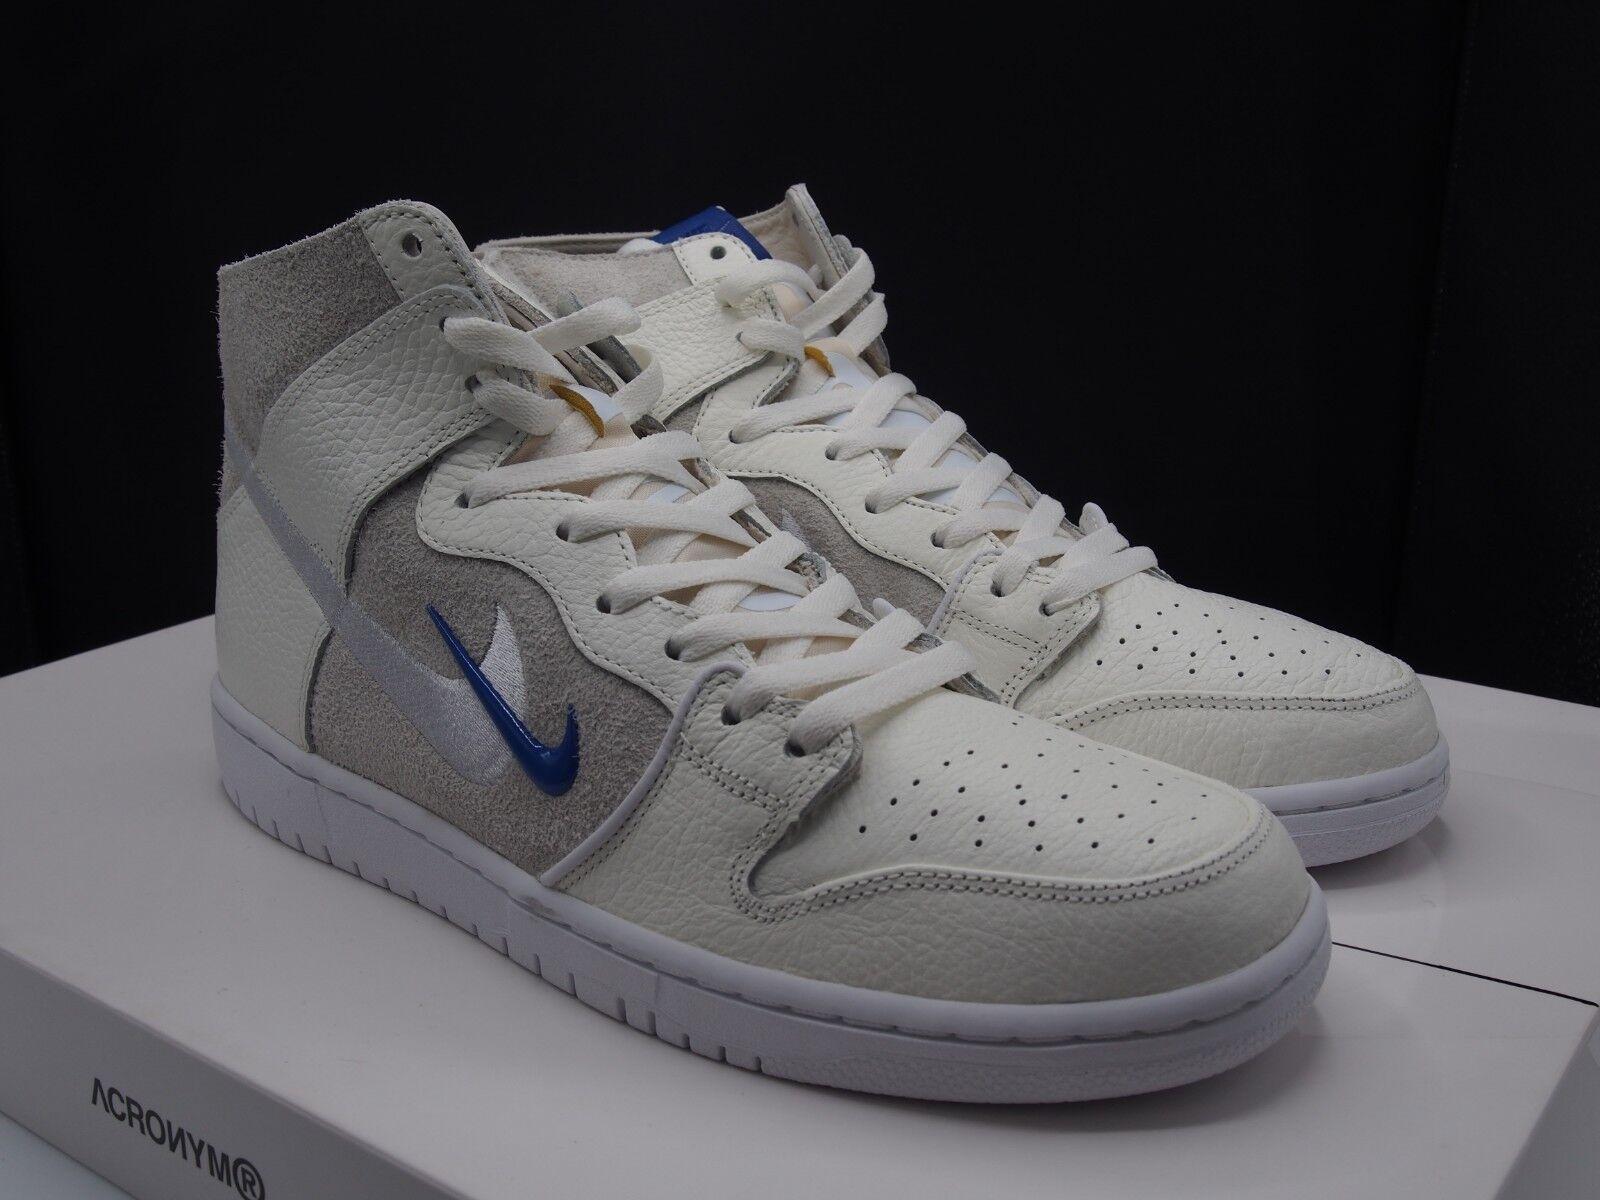 Nike SB Zoom Dunk High Pro QS SoulLand FRI.day AH9613-141 Men's size 11 US